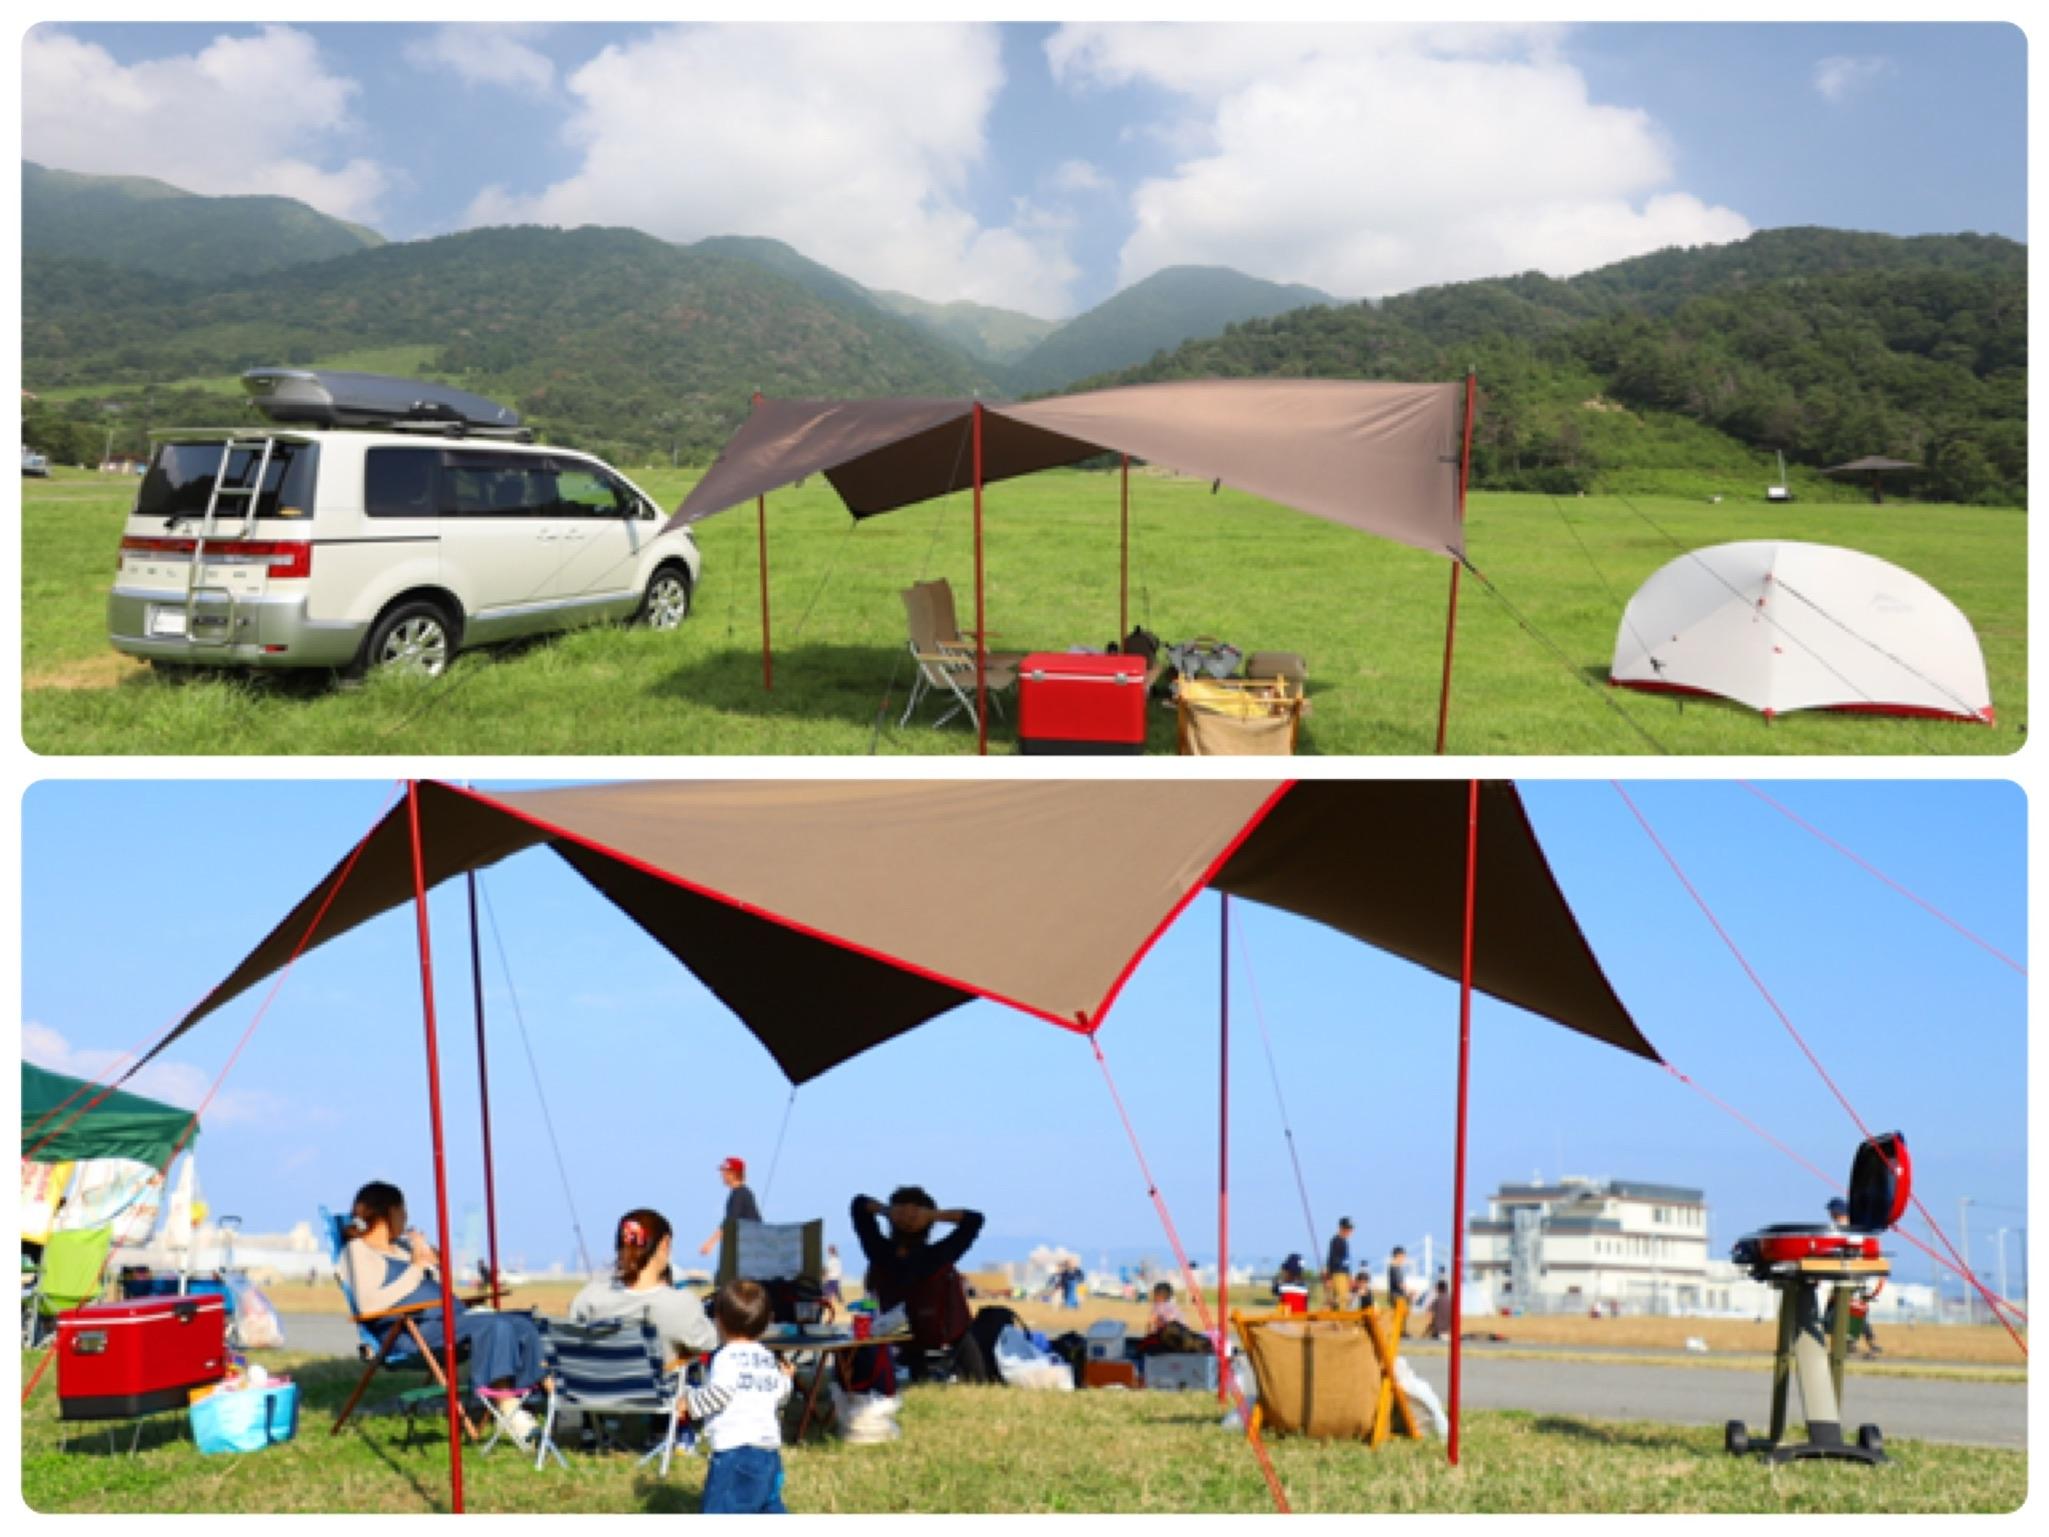 Campに関する素朴な疑問。オートキャンプ場とキャンプ場の違いとは??